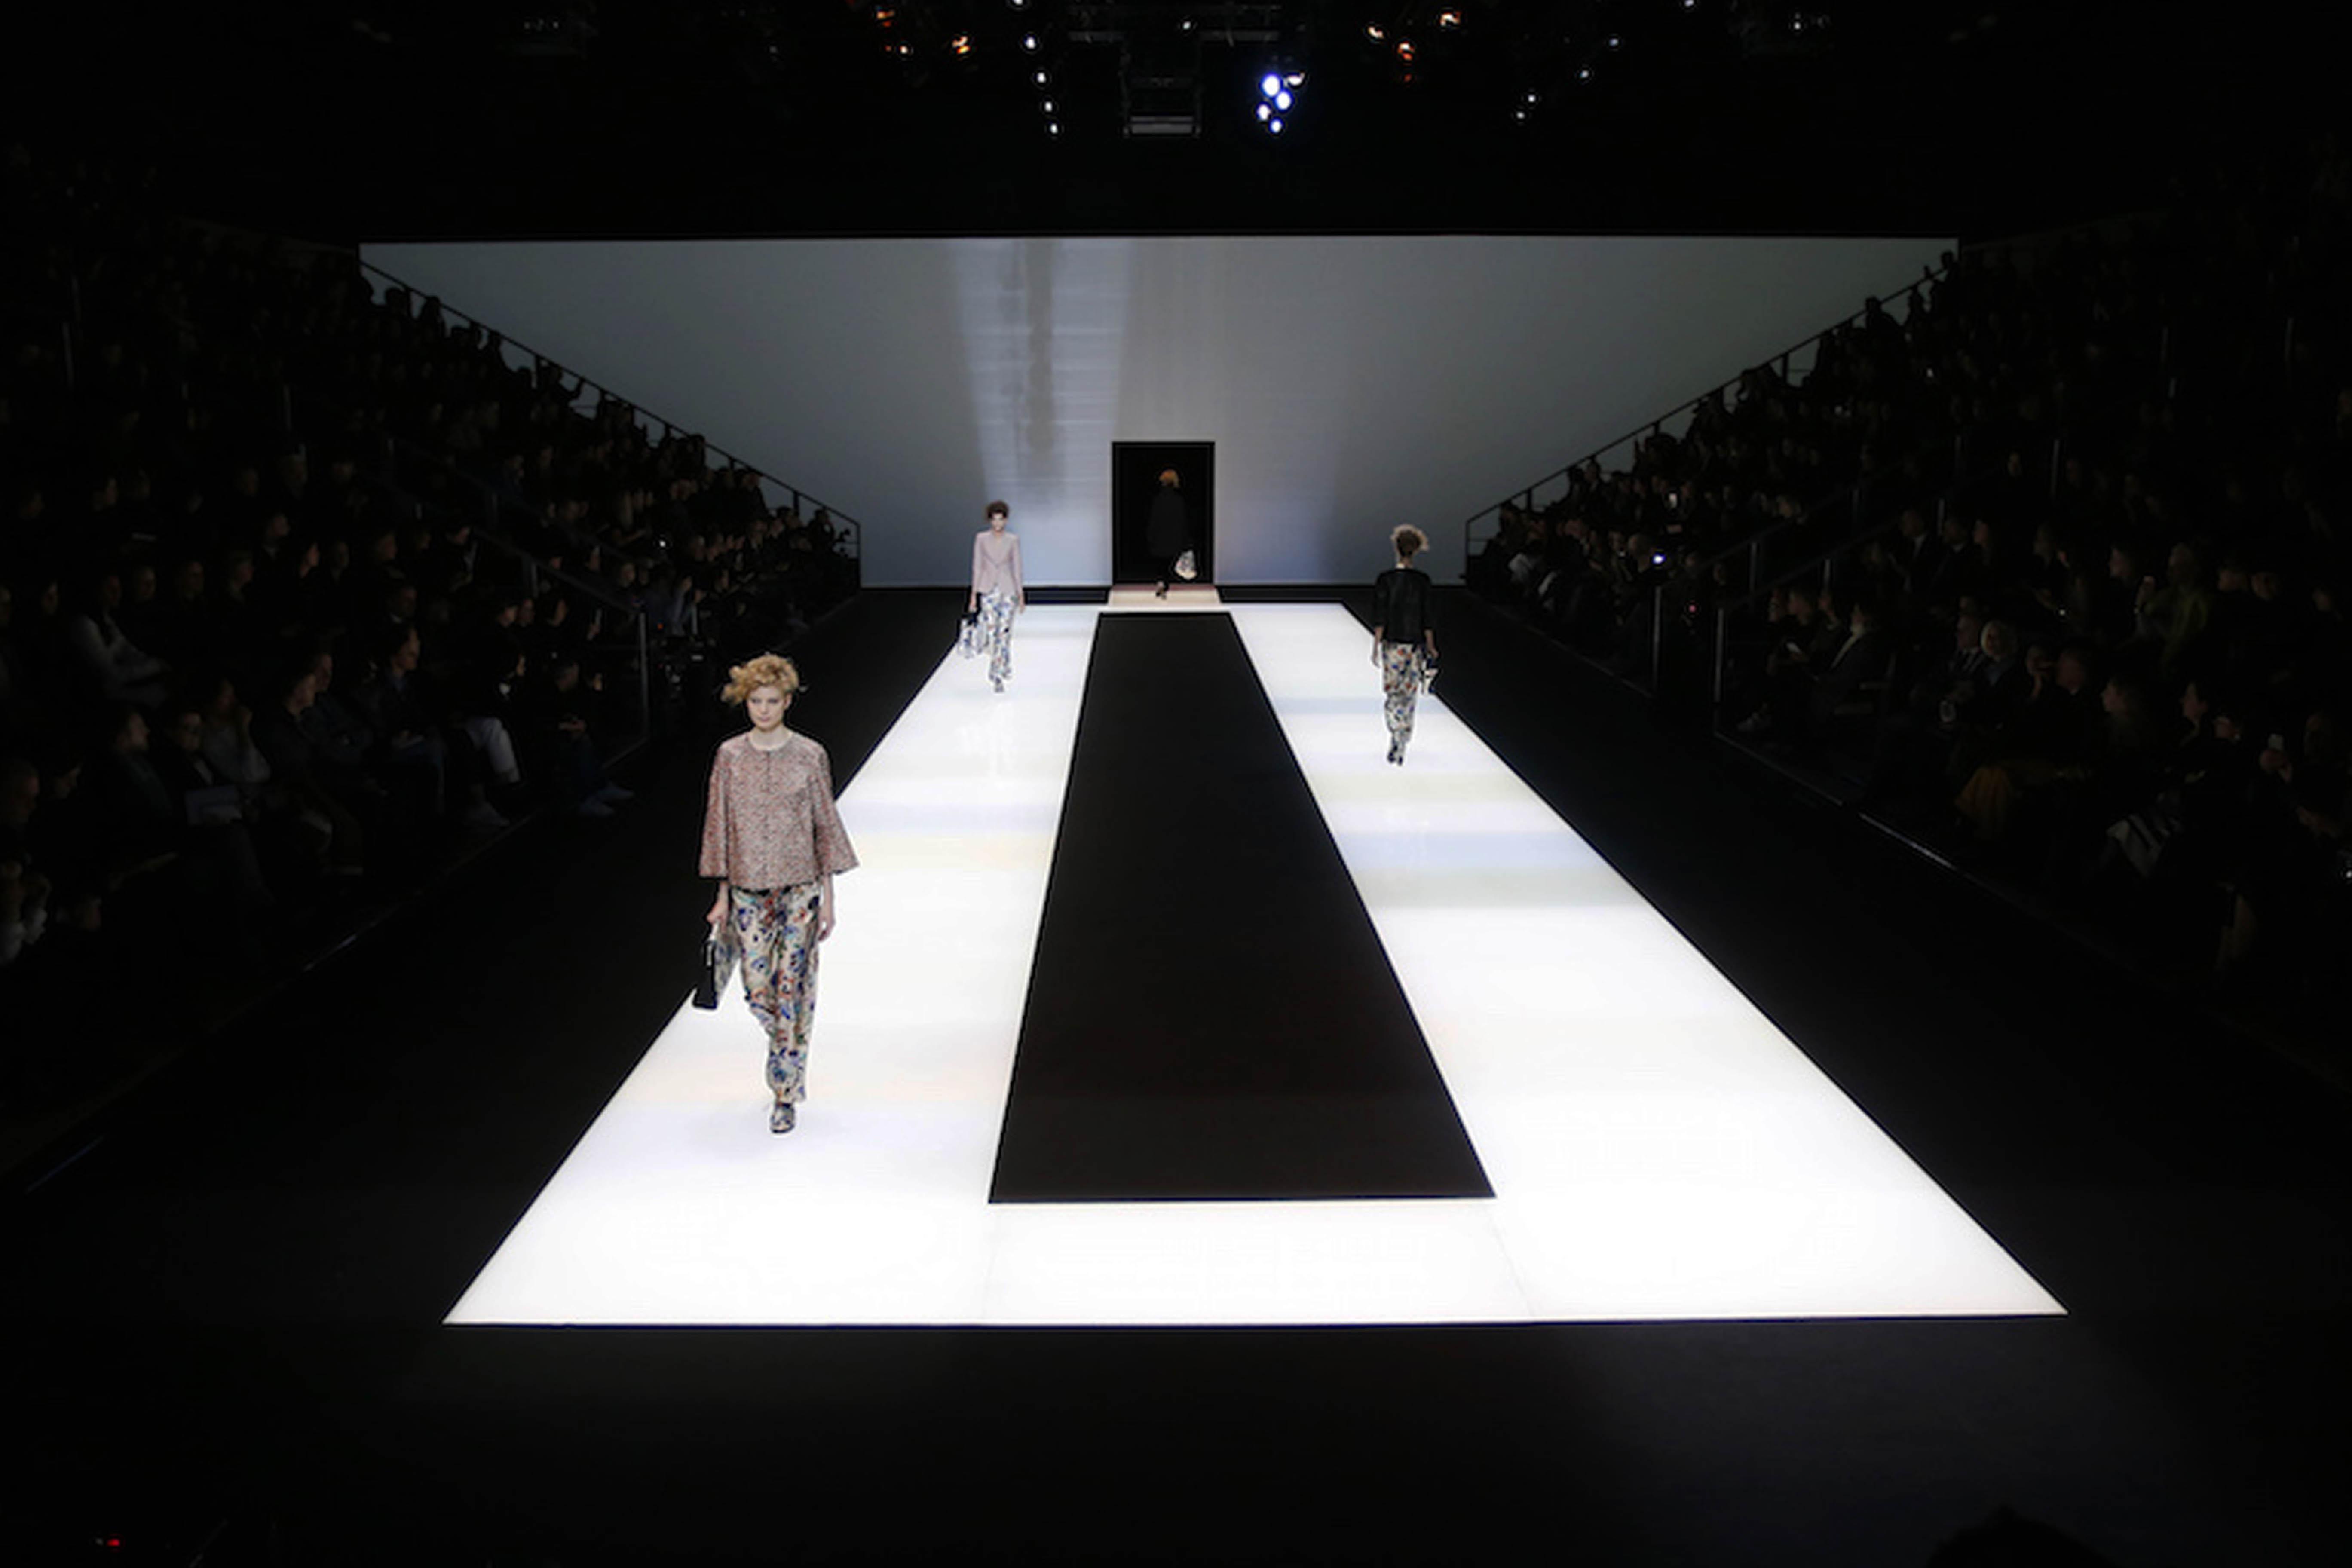 Minimalist b&w catwalk for Giorgio Armani